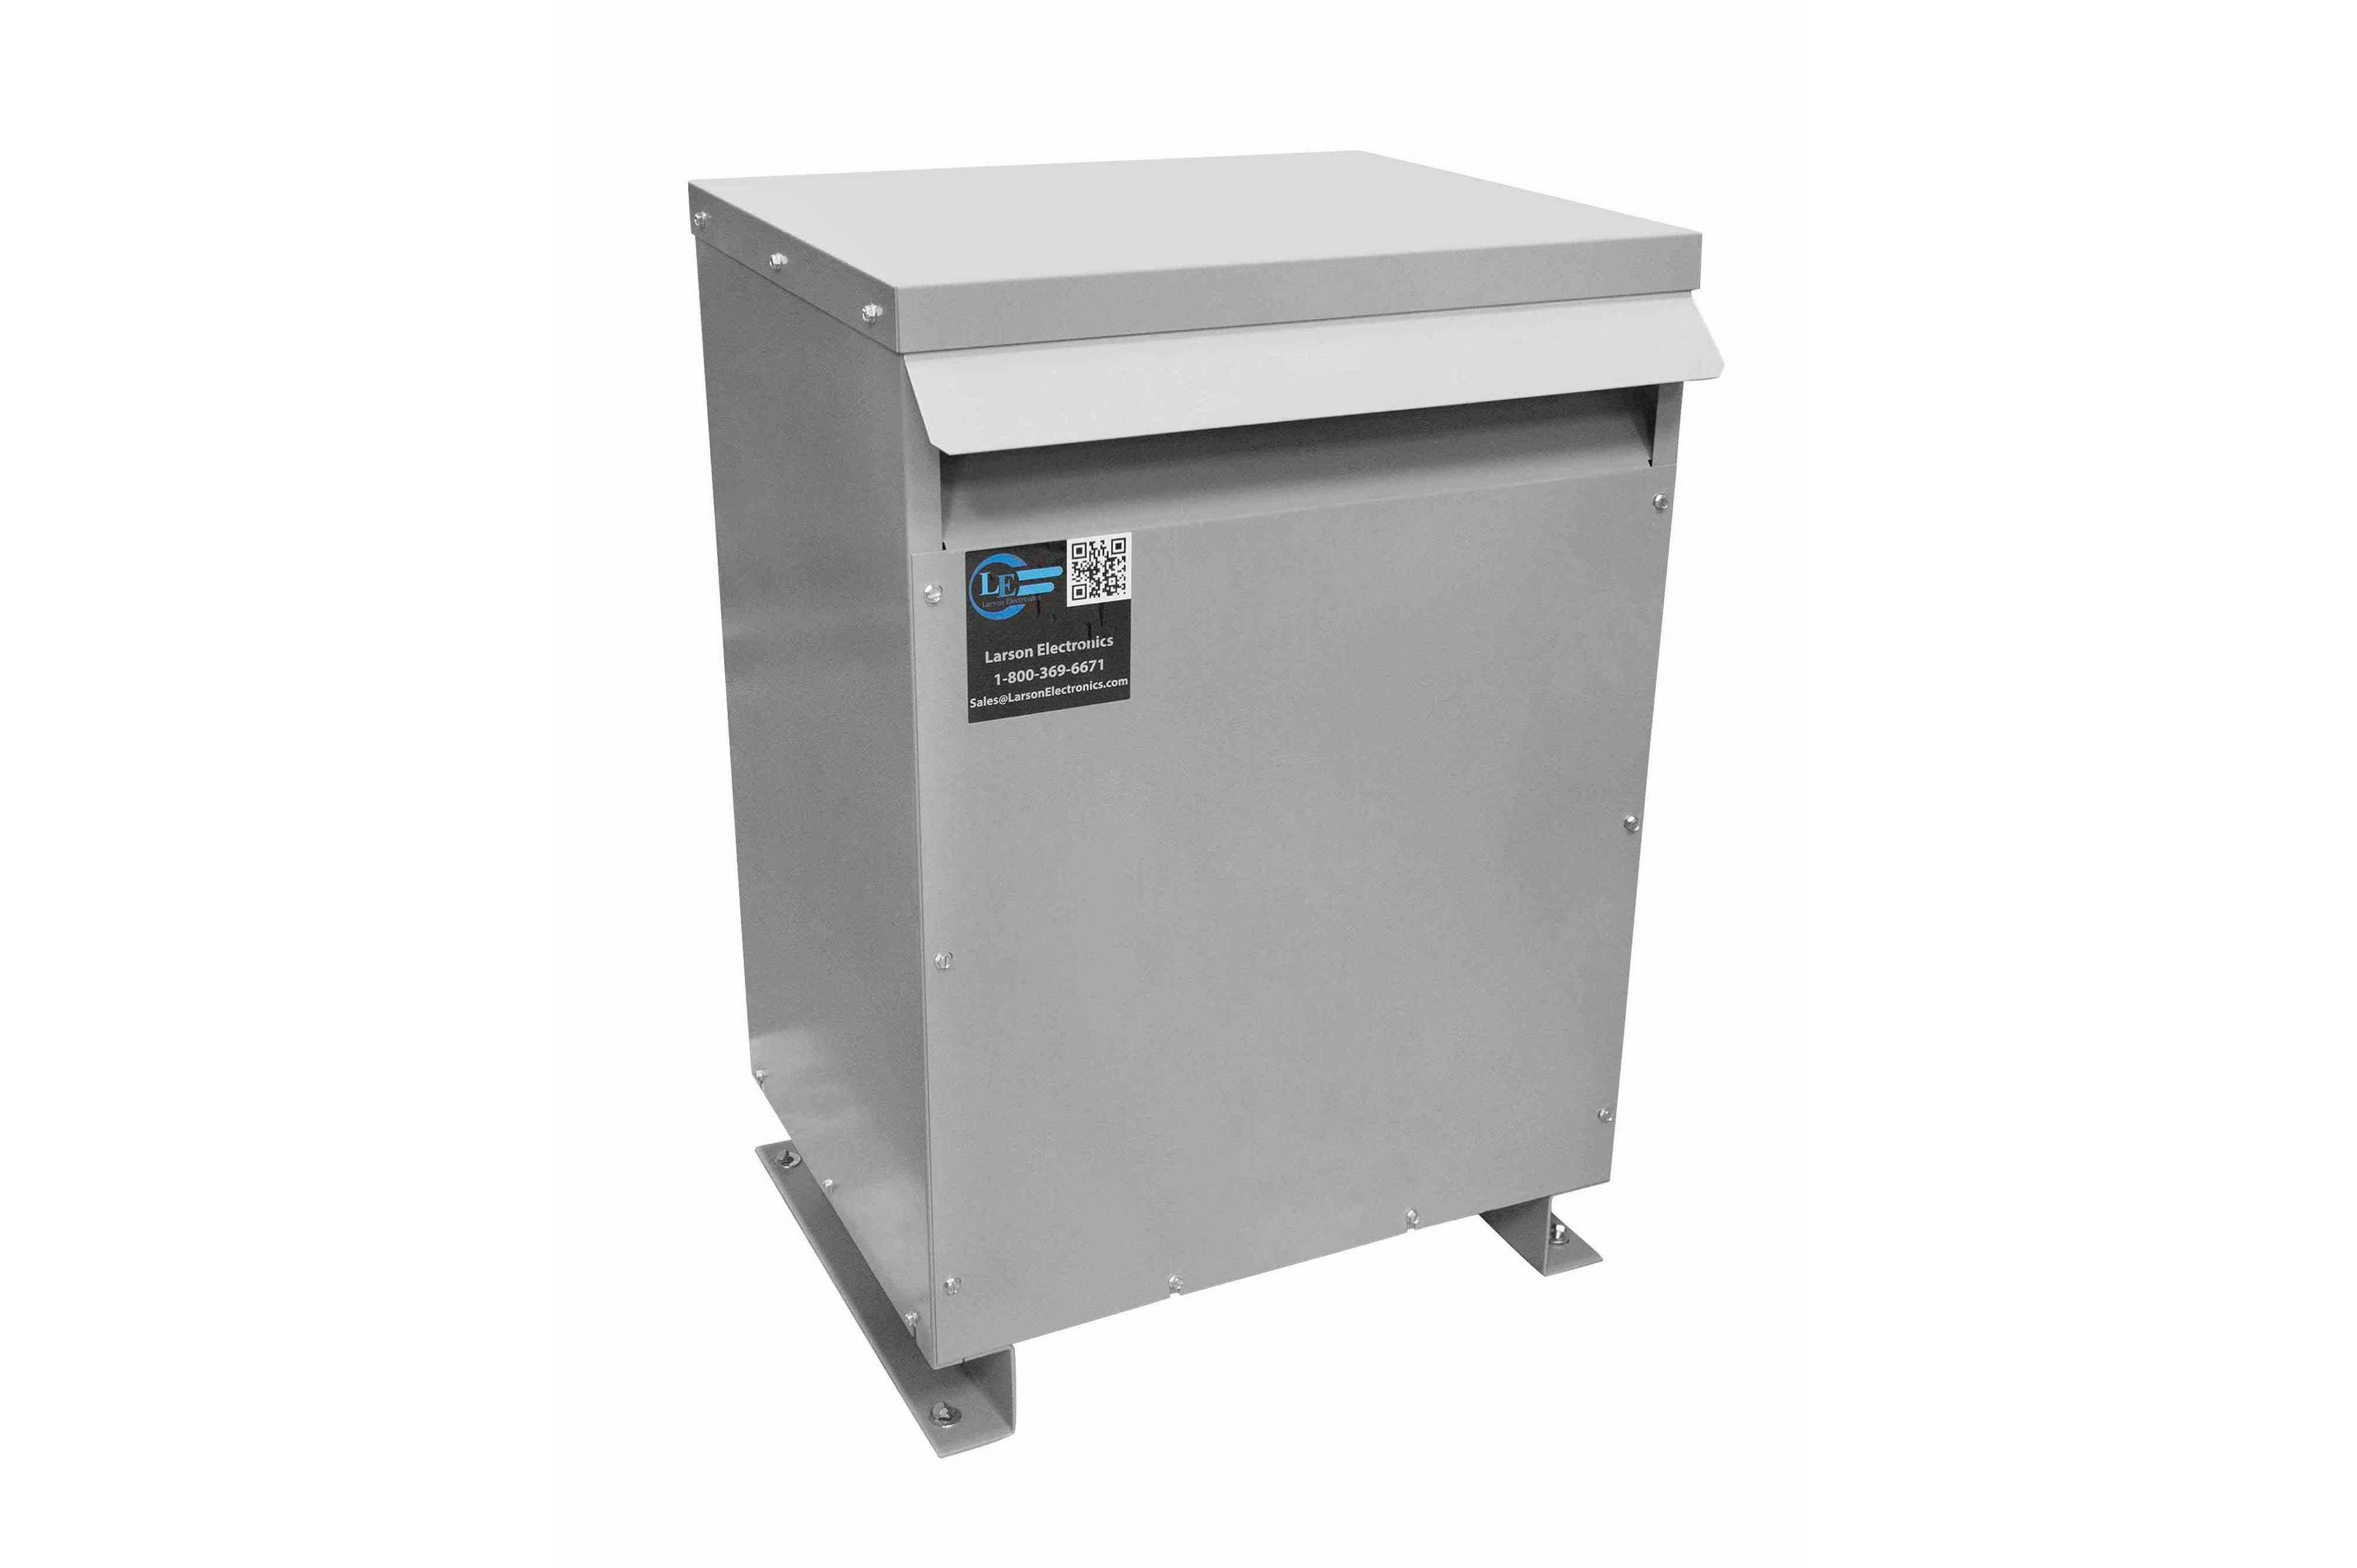 36 kVA 3PH Isolation Transformer, 208V Wye Primary, 240V/120 Delta Secondary, N3R, Ventilated, 60 Hz